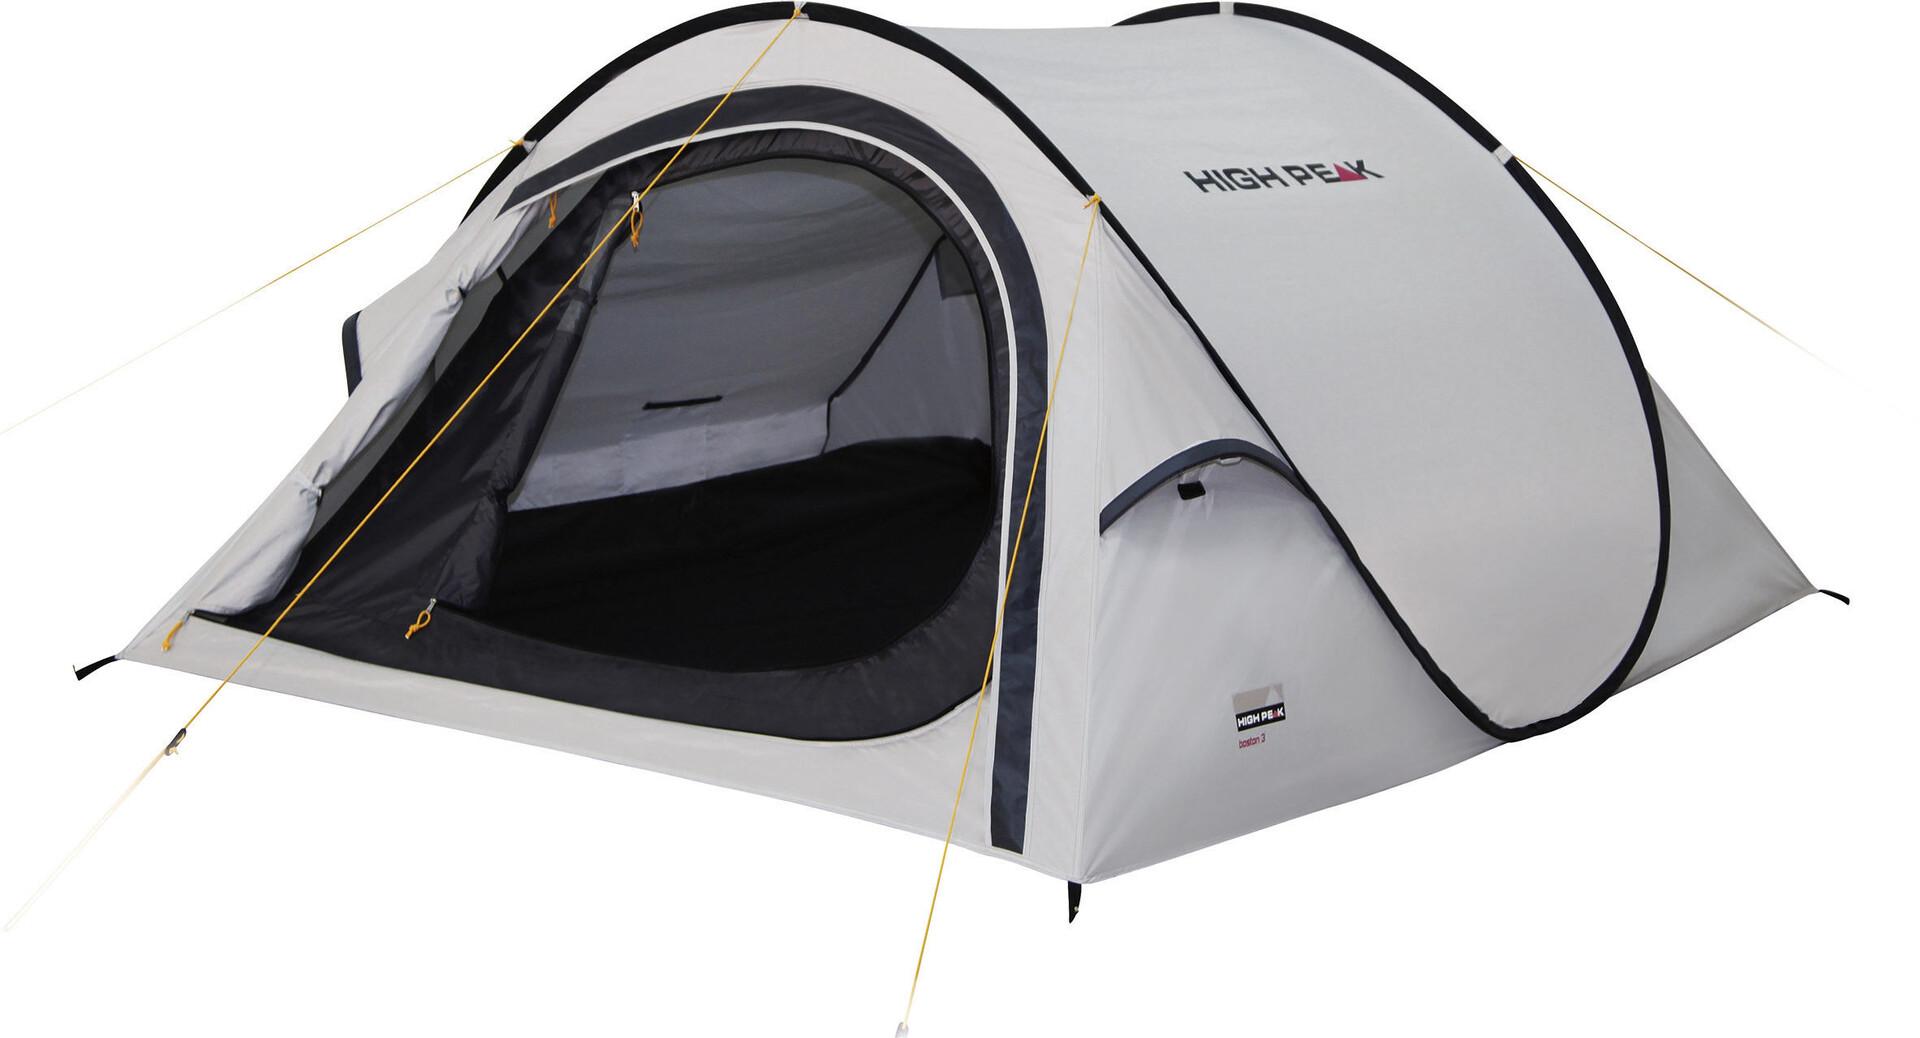 High Peak Boston 2 Tent aluminiumdark grey | Gode tilbud